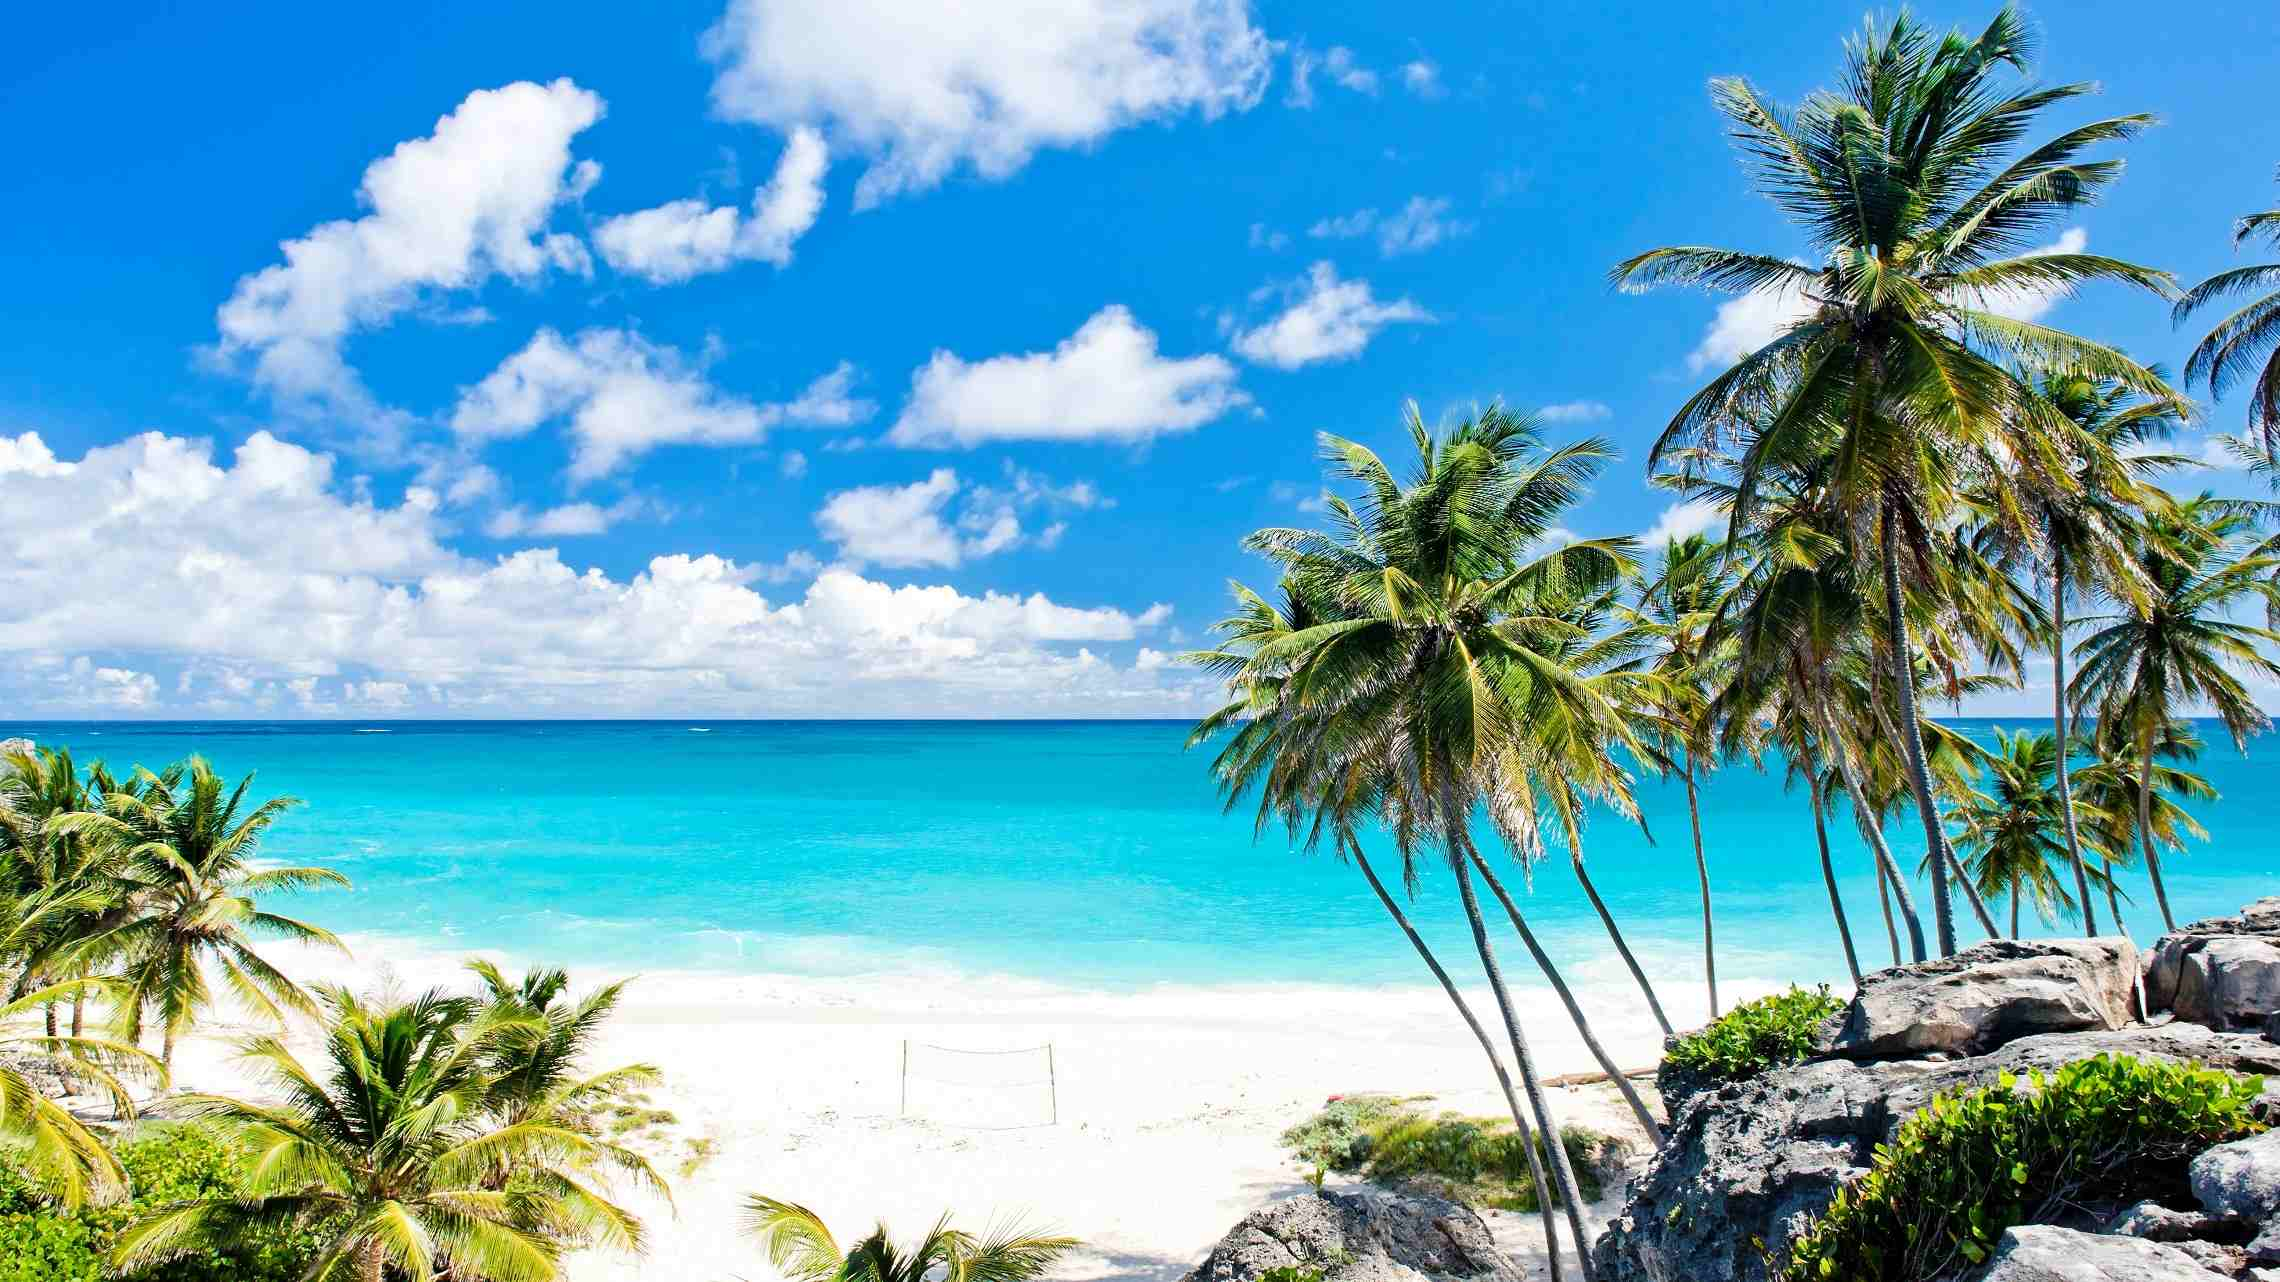 Bottom-Bay-ranta-Barbados-Karibia-1920x1080.jpg